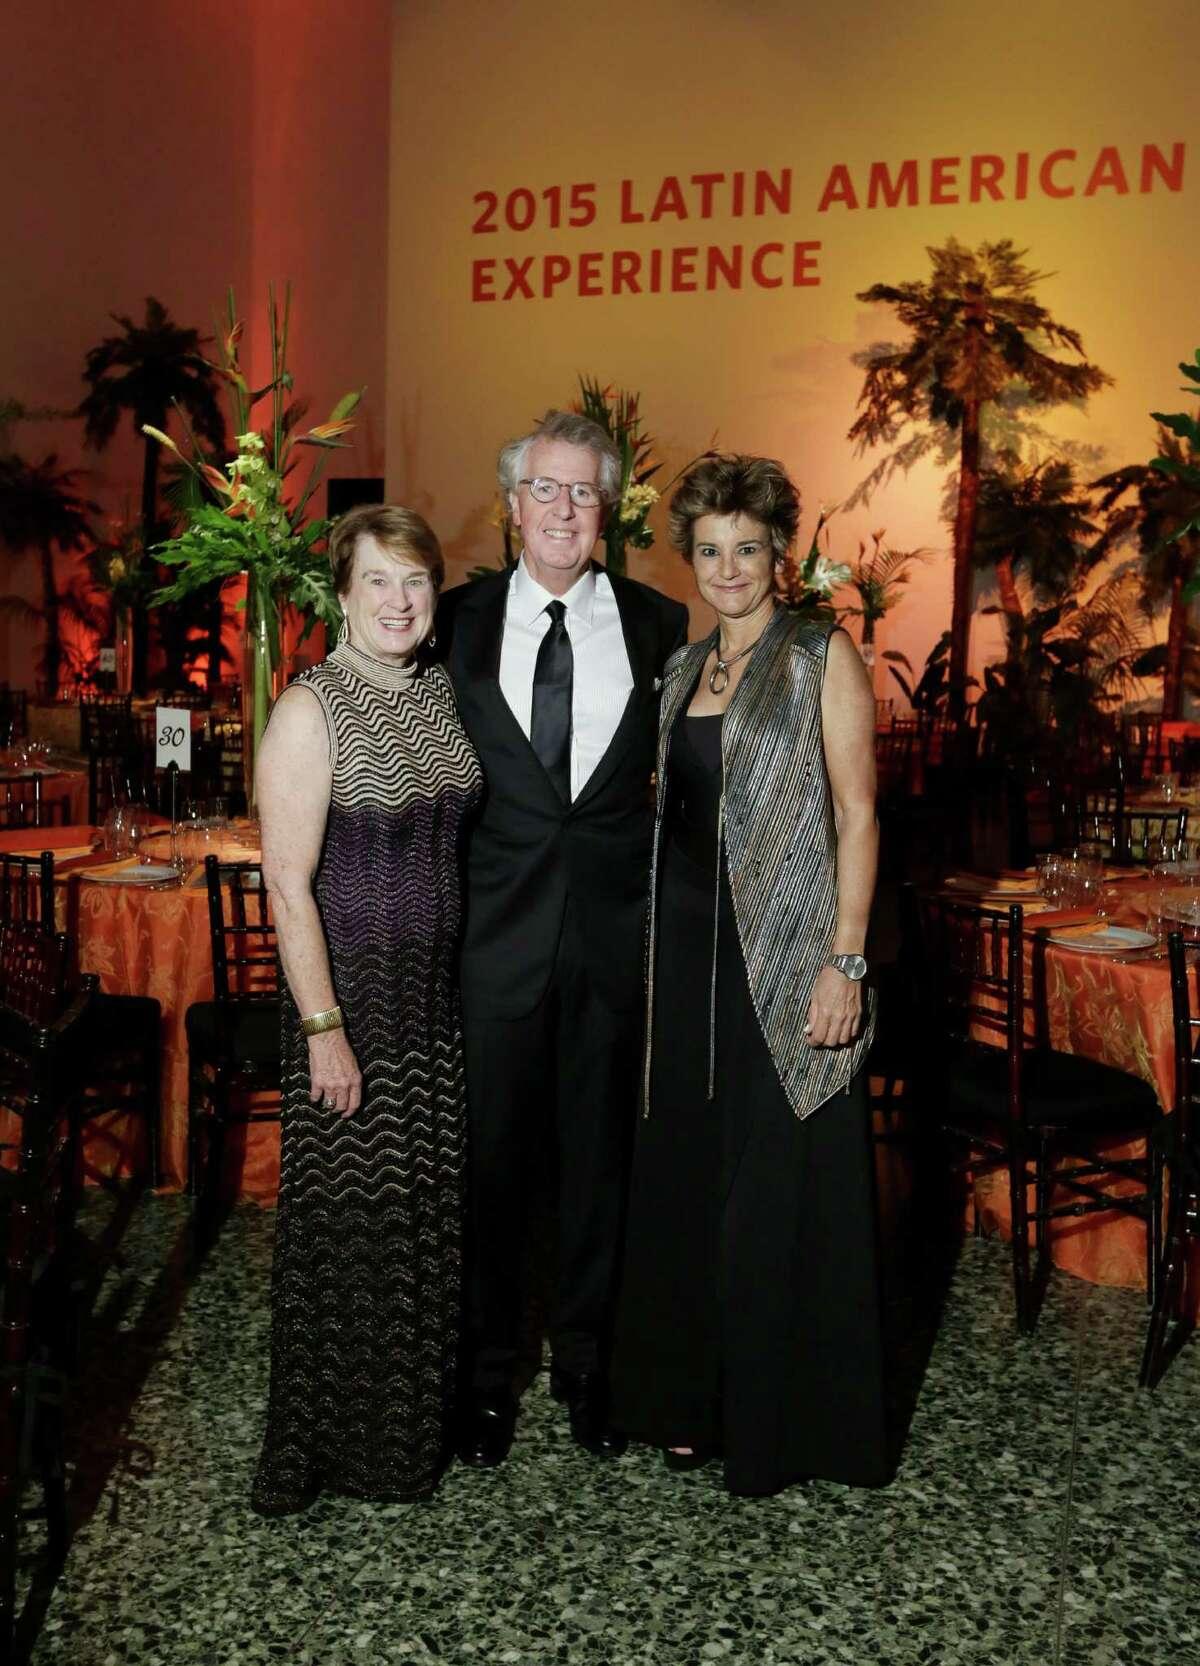 Linda and George Kelly and Mari Carmen Ramirez